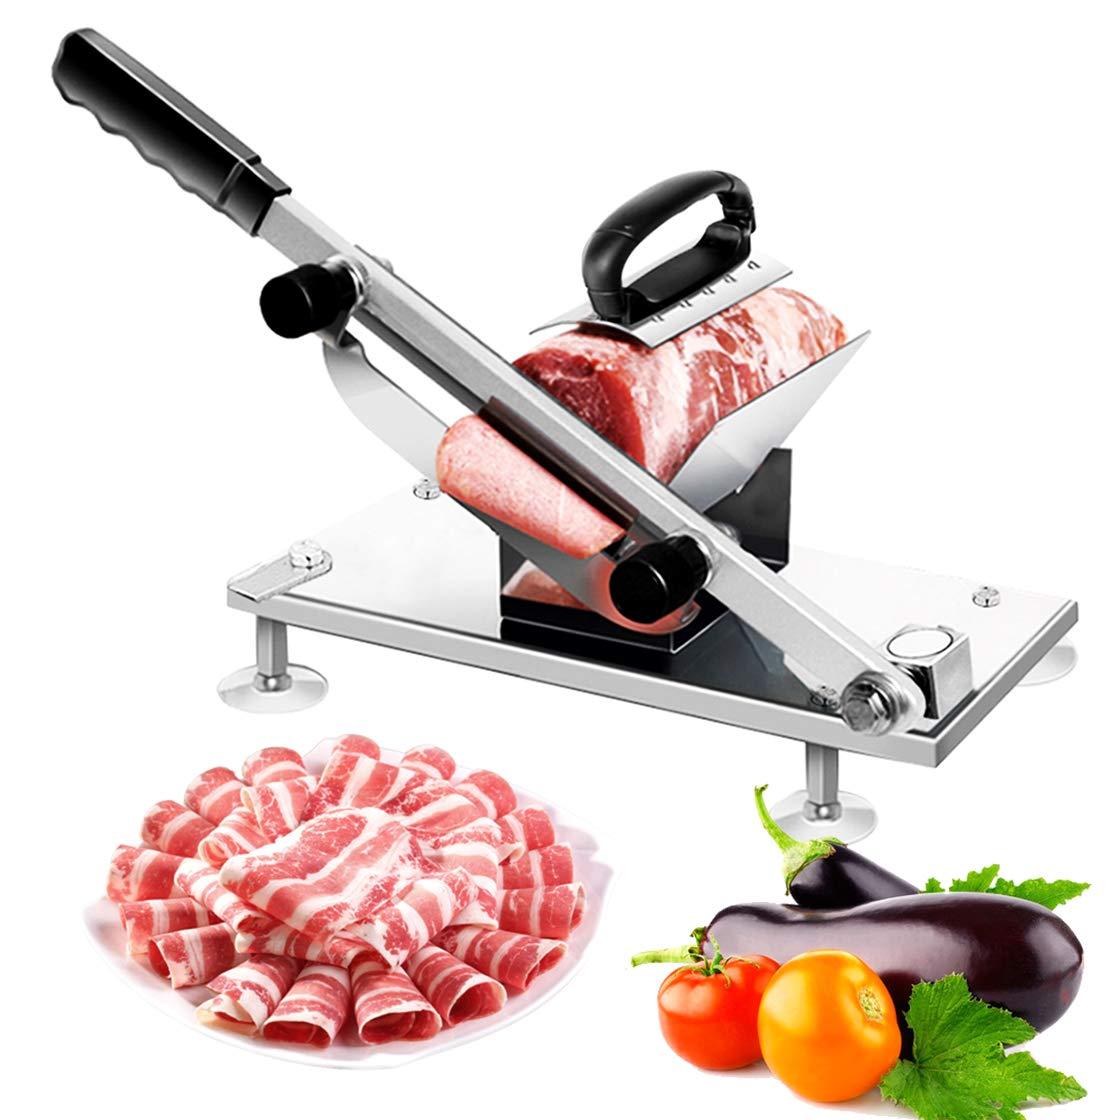 Stainless Vegetable Slicing Machine Kitchen